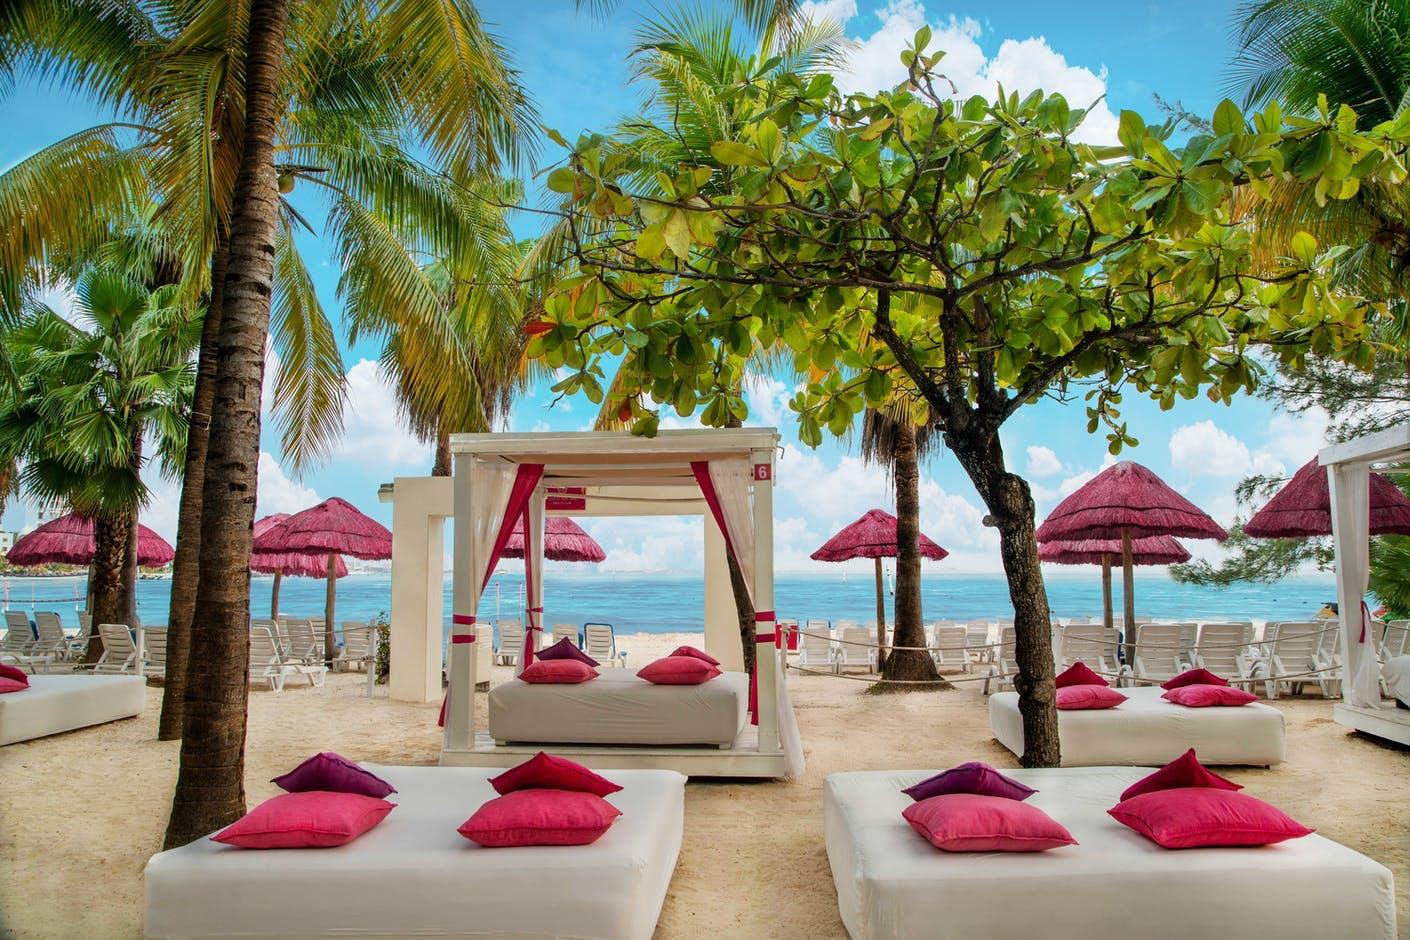 Oasis palm beach